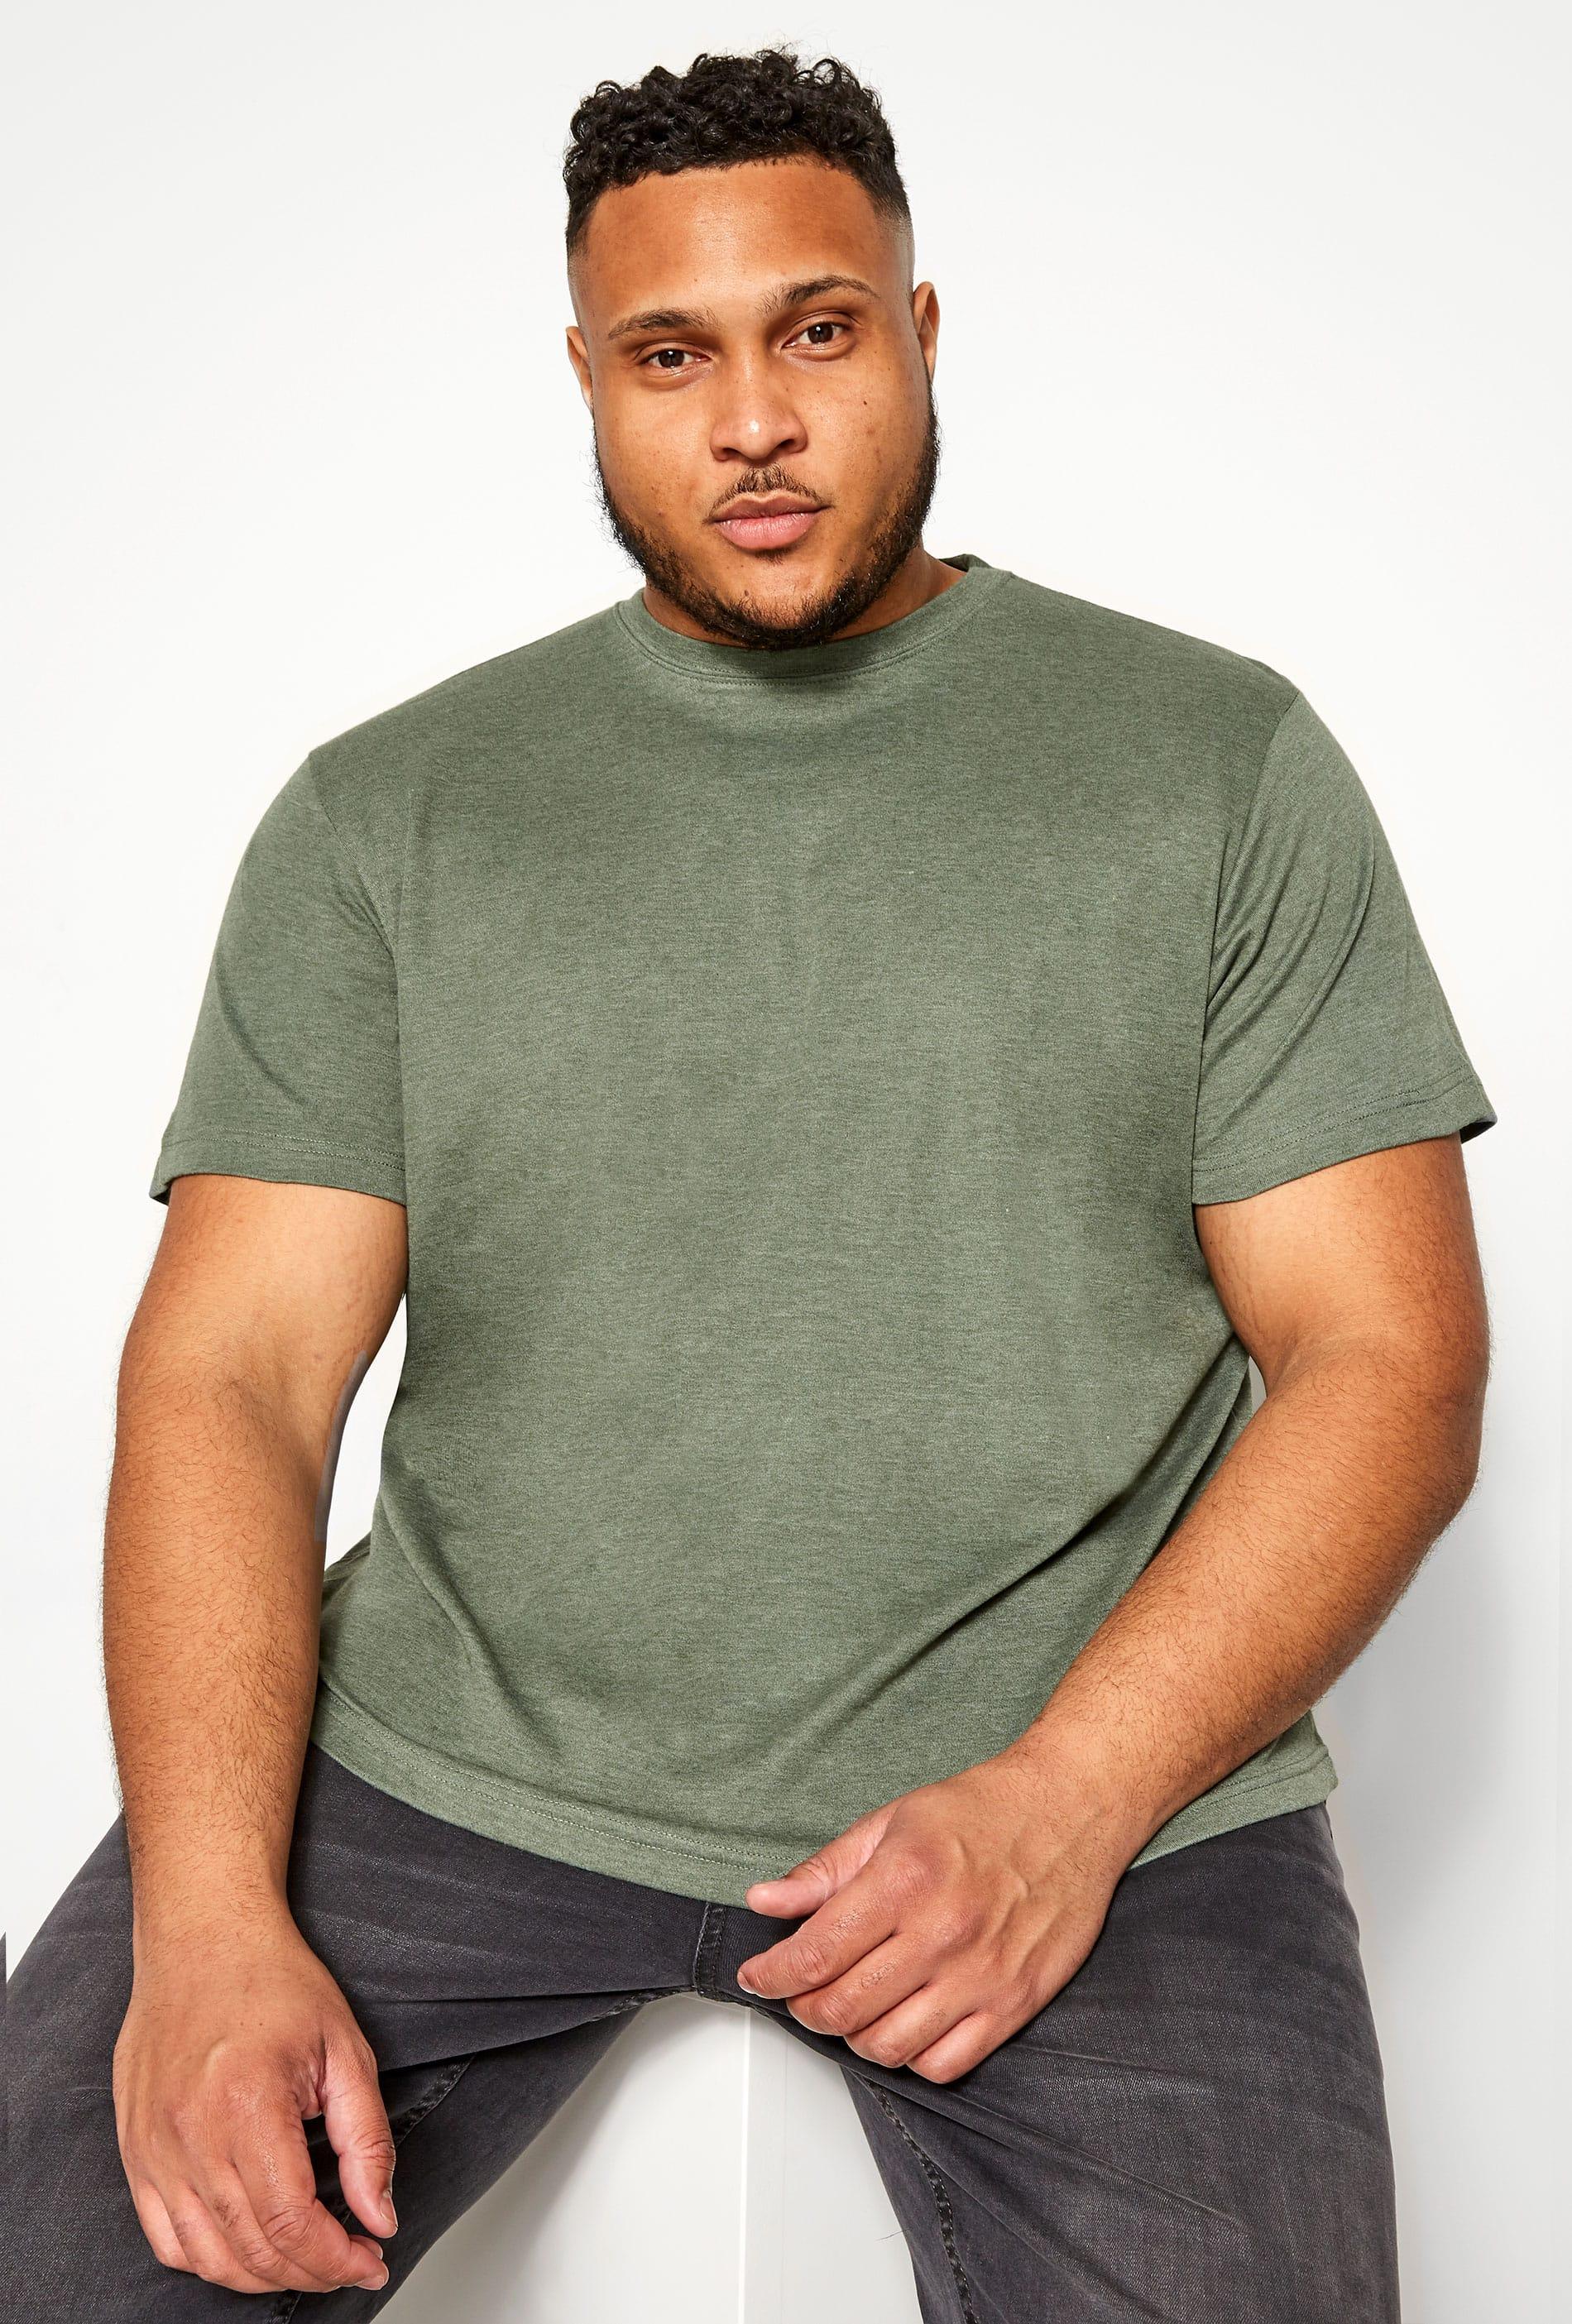 BAR HARBOUR Sage Green Marl Plain Crew Neck T-Shirt